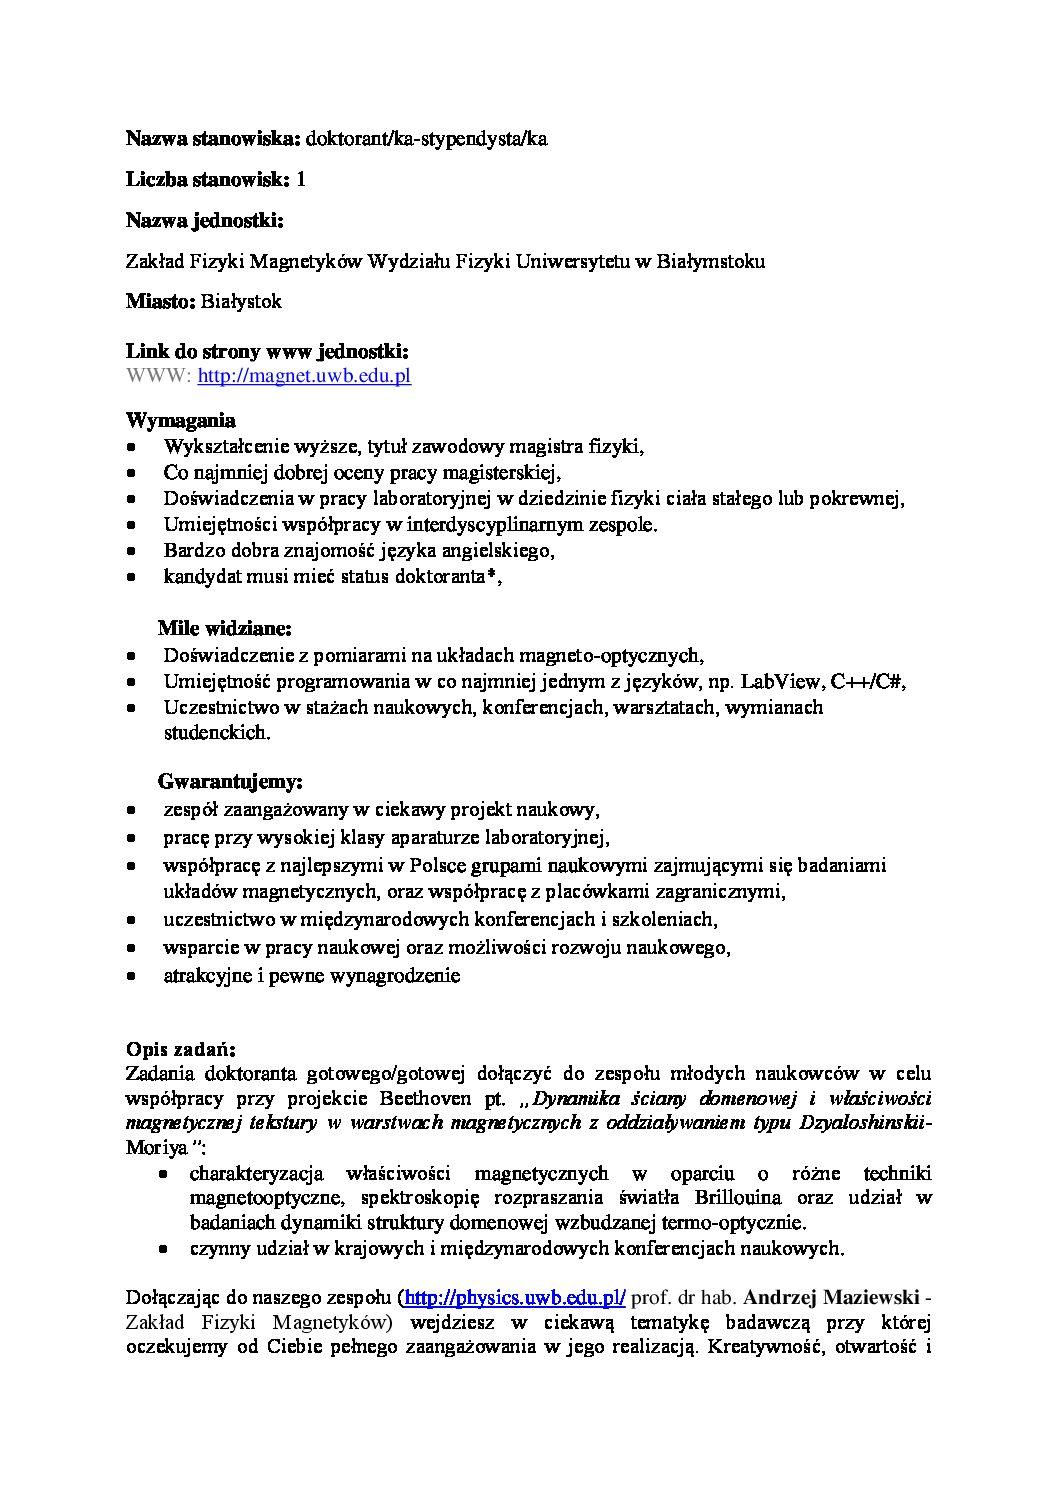 Oferta pracy dla doktoranta NCN   2018/04/03